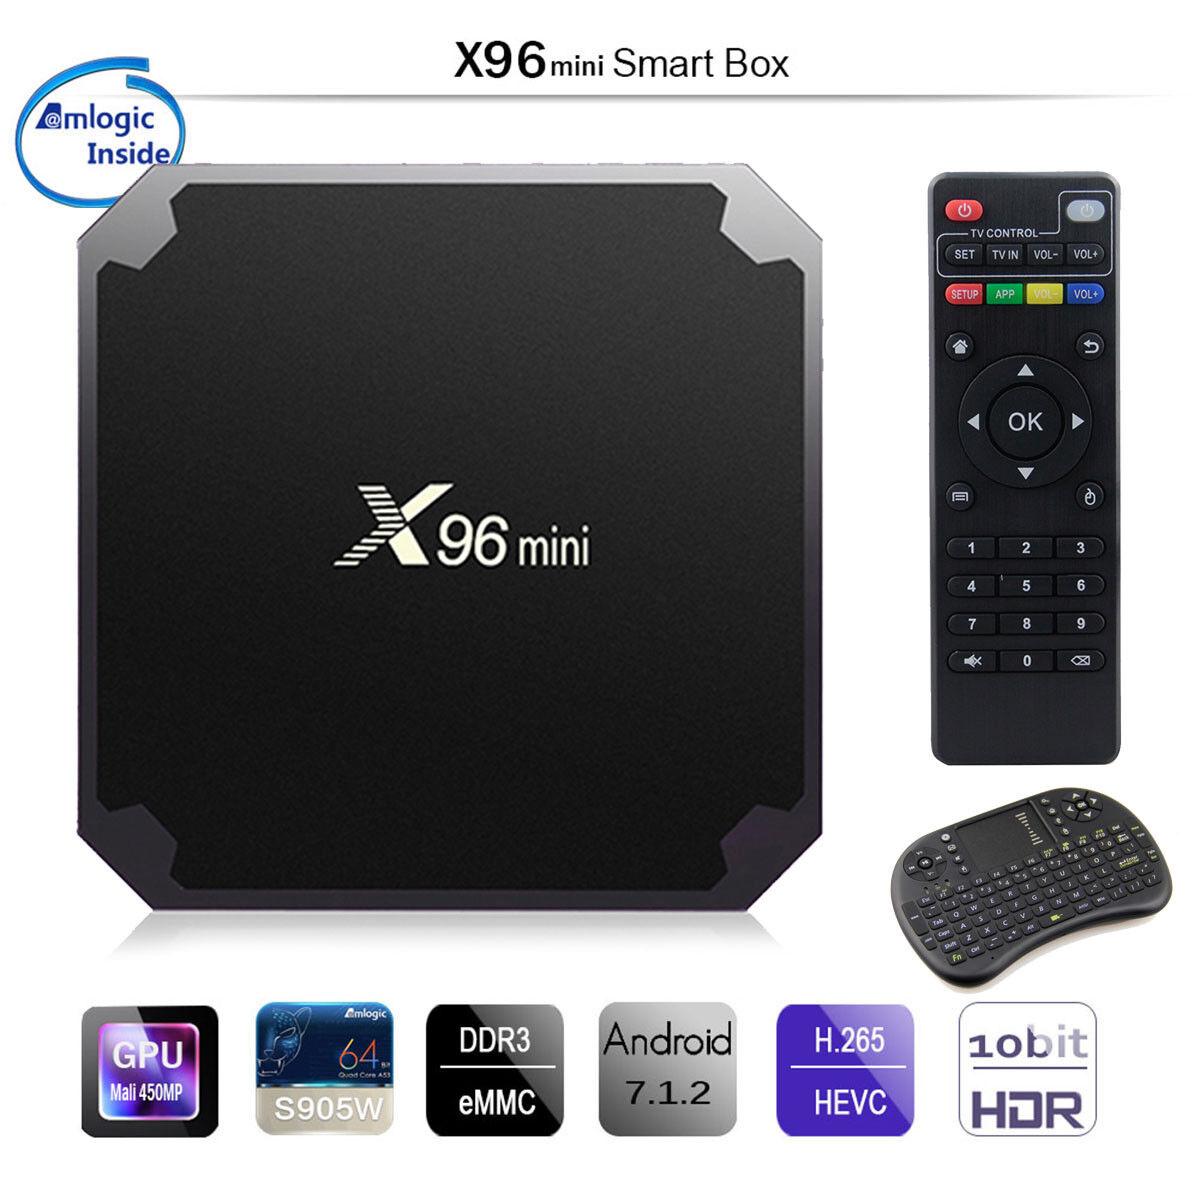 s-l1600 Hot X96 Mini 8G 16G Amlogic S905W Quad Core 4K WIFI Smart TV Box Android 7.1 FZC